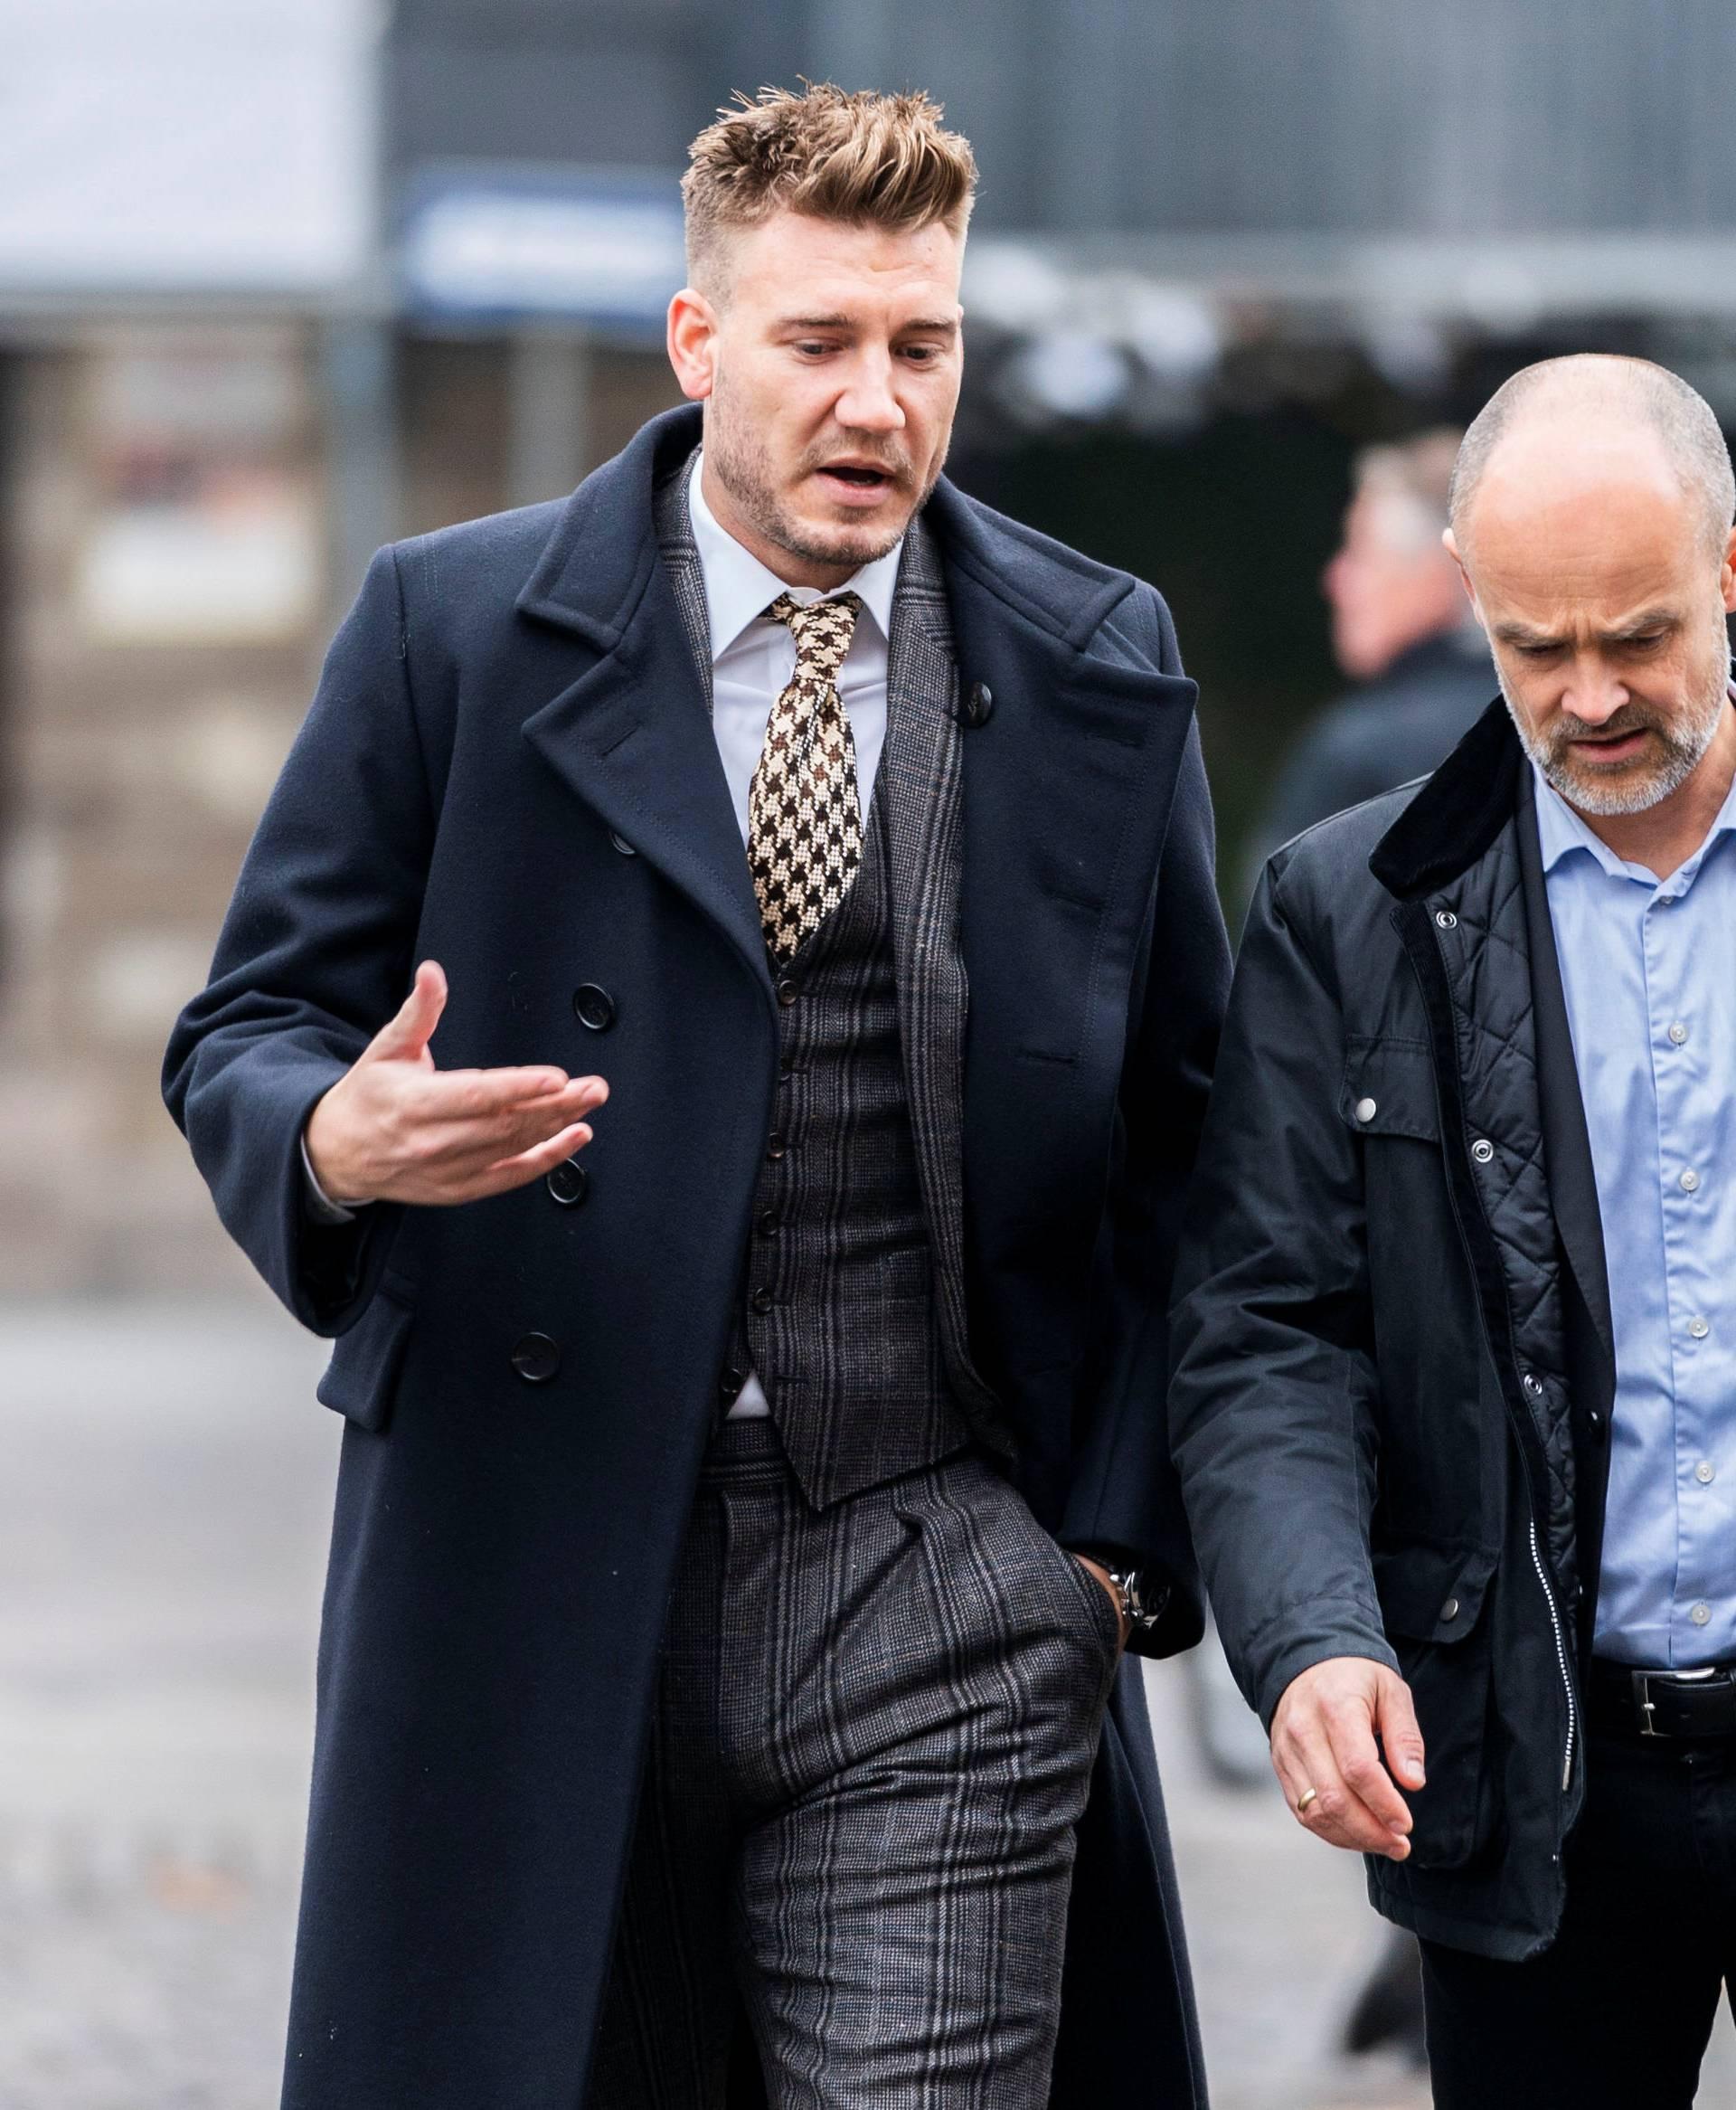 Denmark striker Nicklas Bendtner and lawyer Anders Nemeth arrive at the Copenhagen City Council